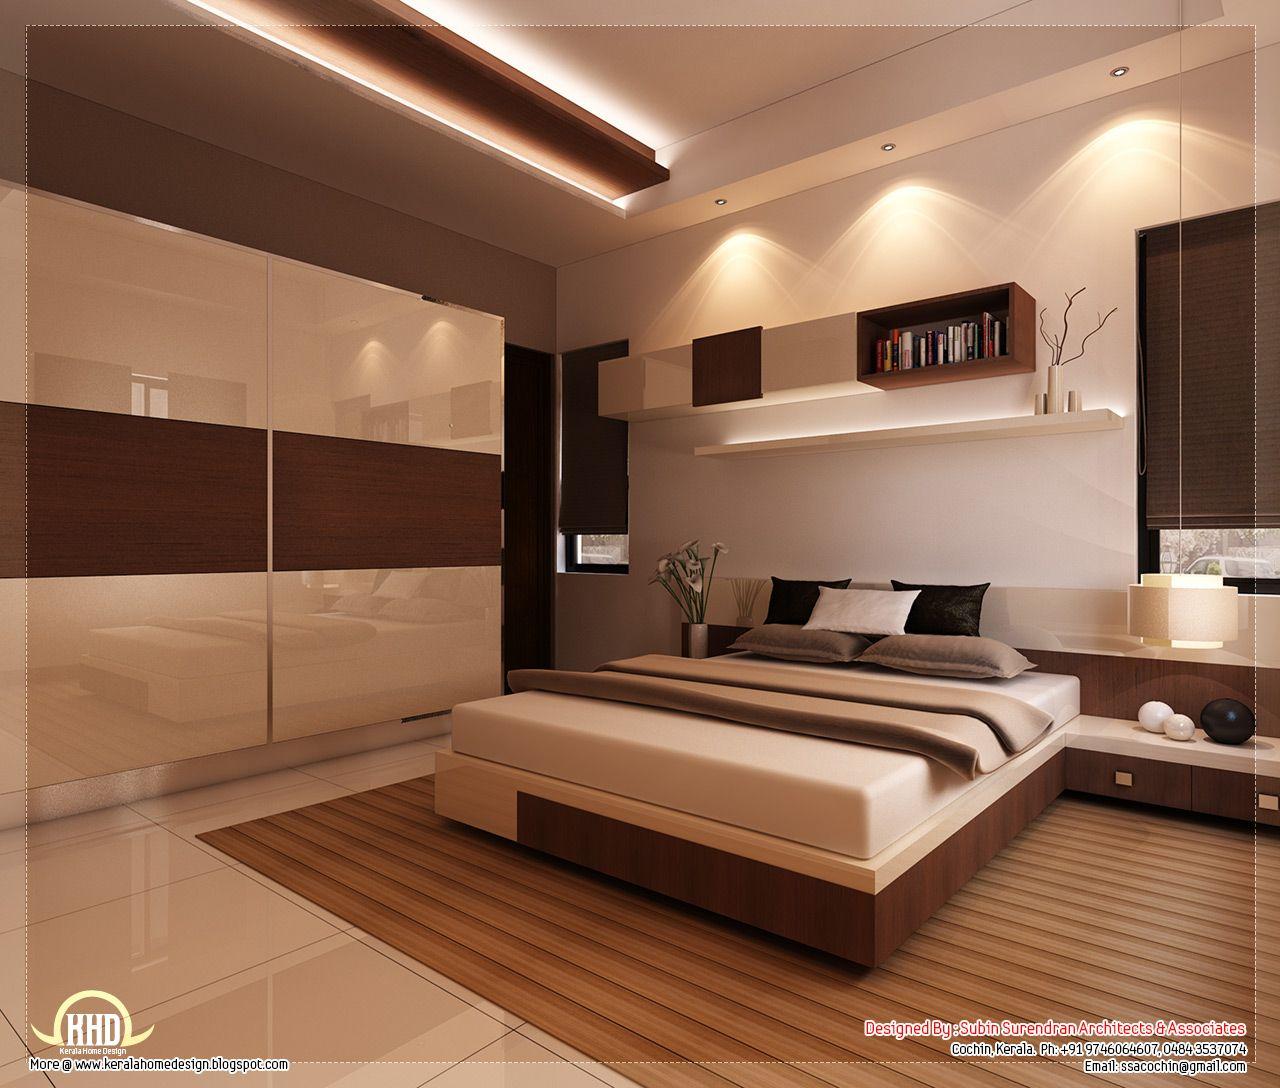 Bedroom interior also beautiful home designs bedrooms pinterest recamara rh co